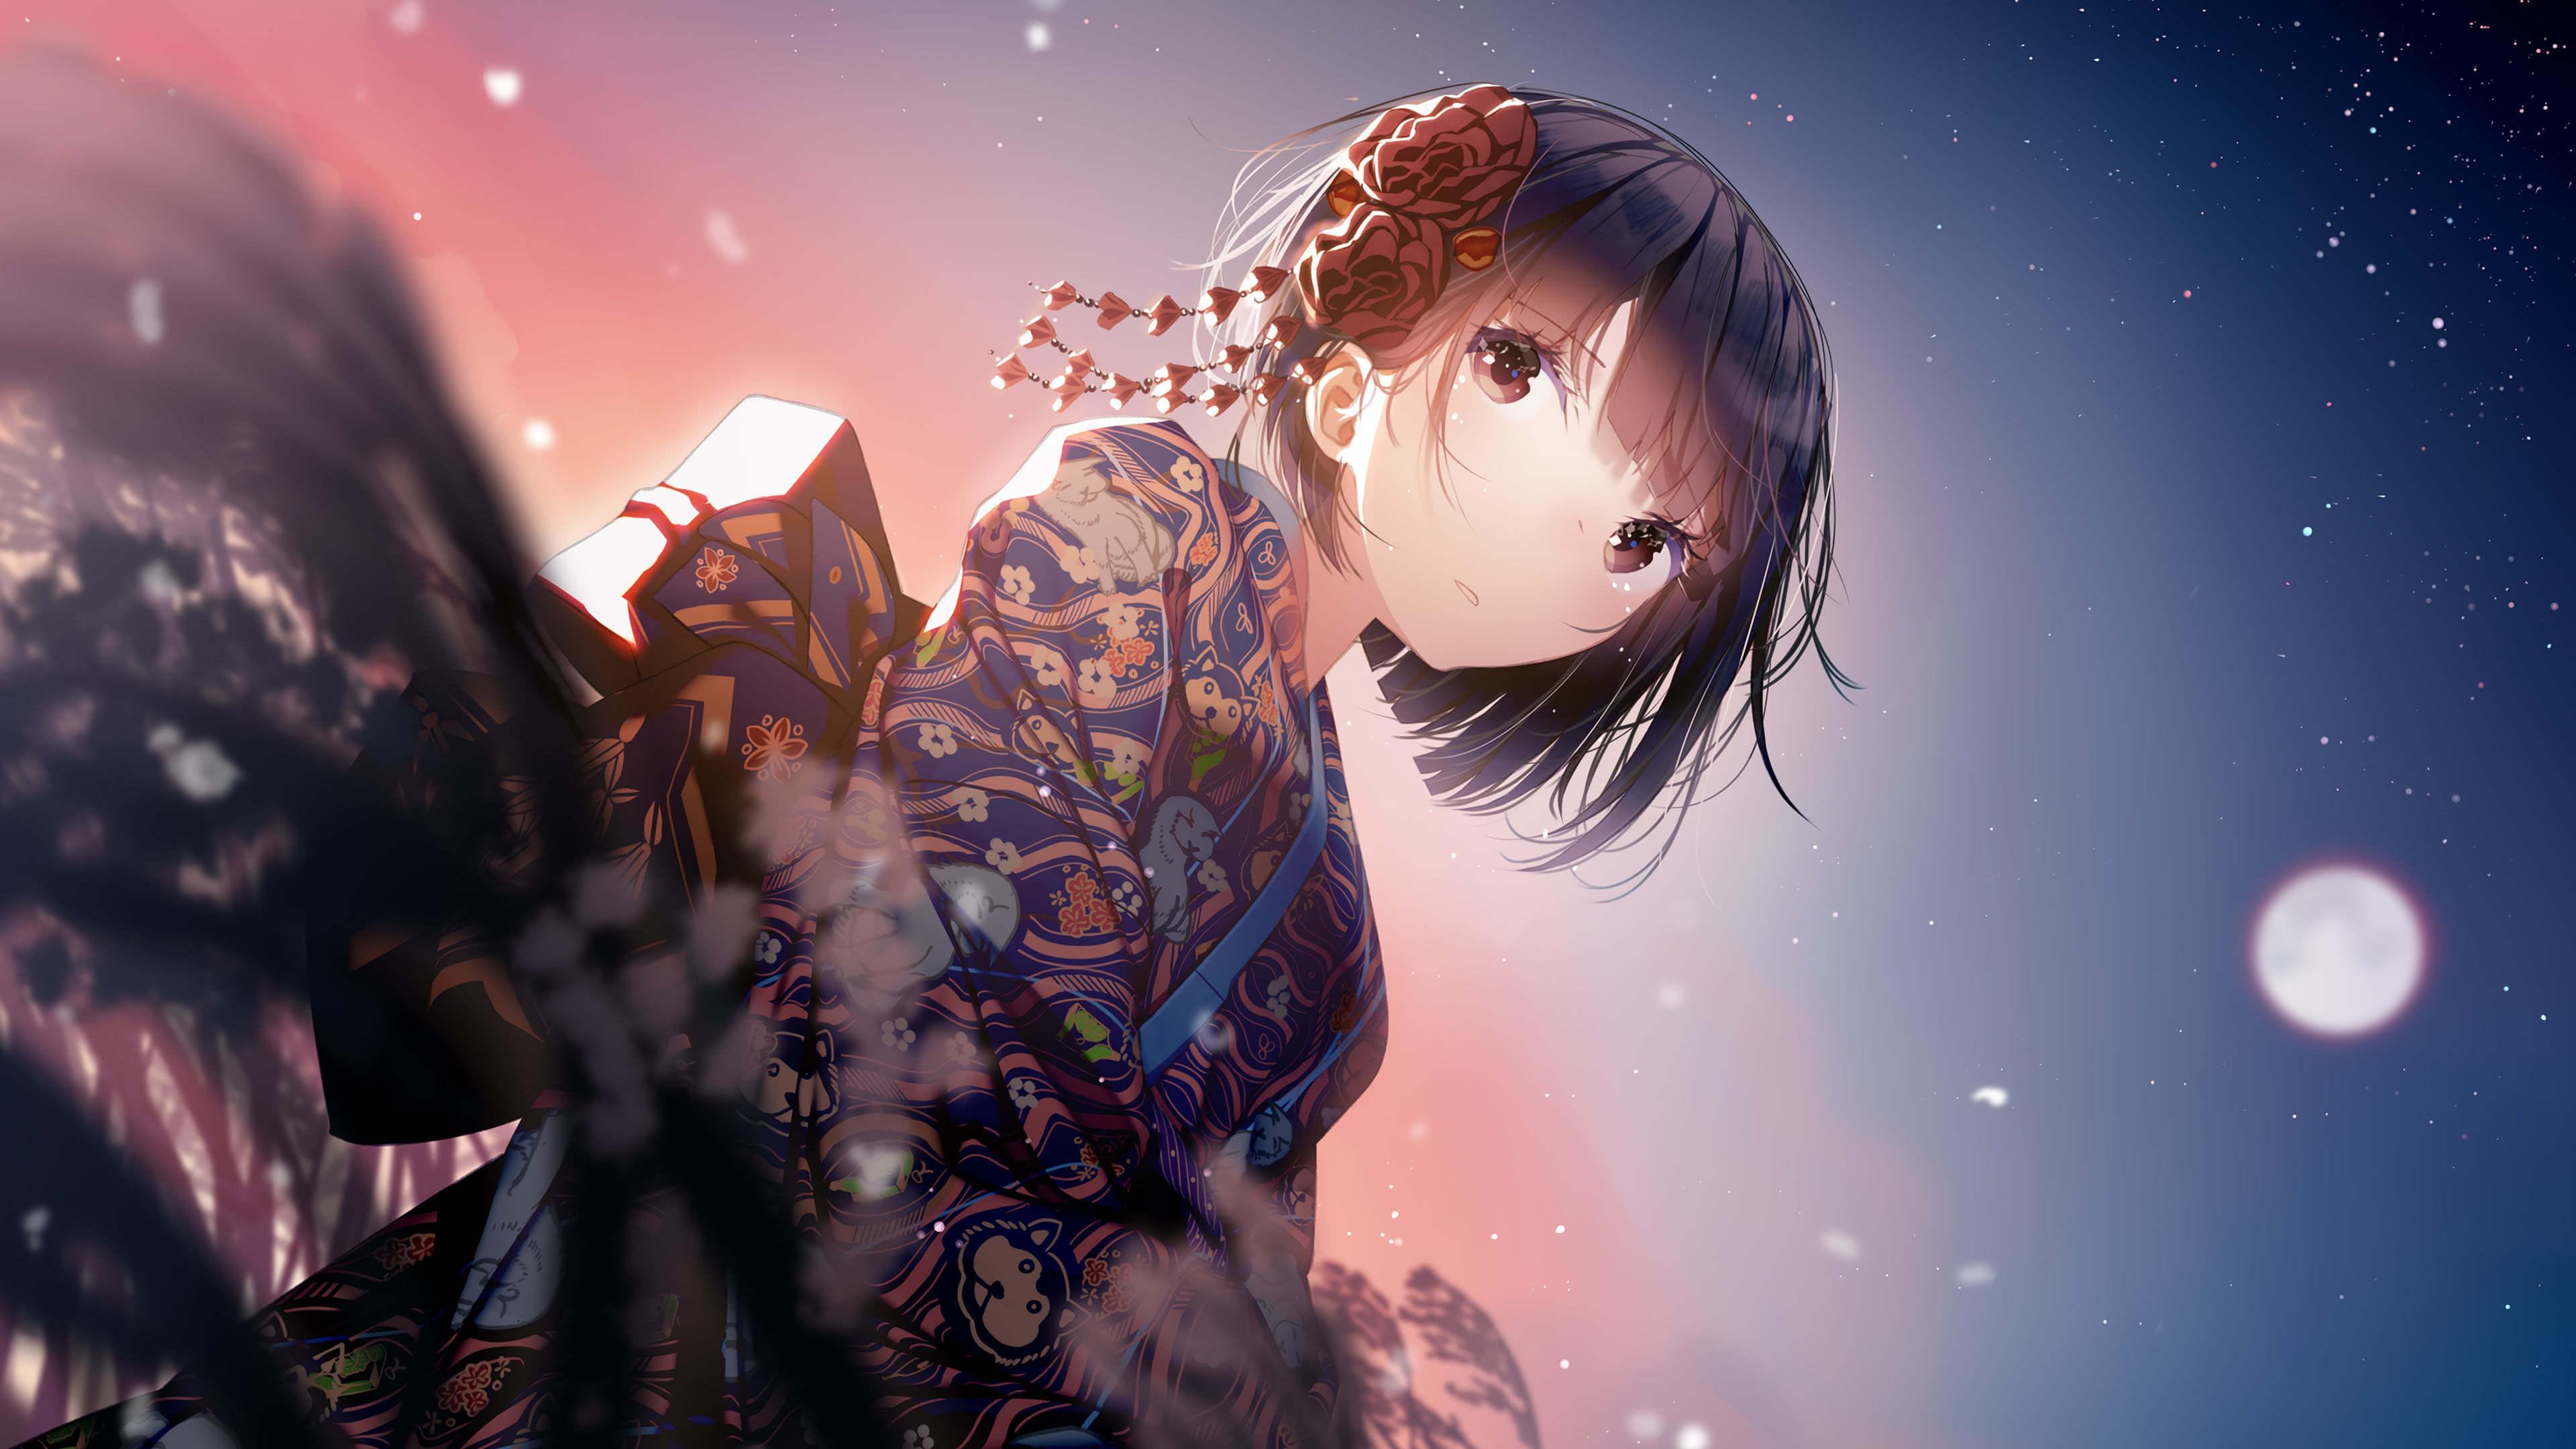 4k Anime Girl Wallpapers Top Free 4k Anime Girl Backgrounds Wallpaperaccess